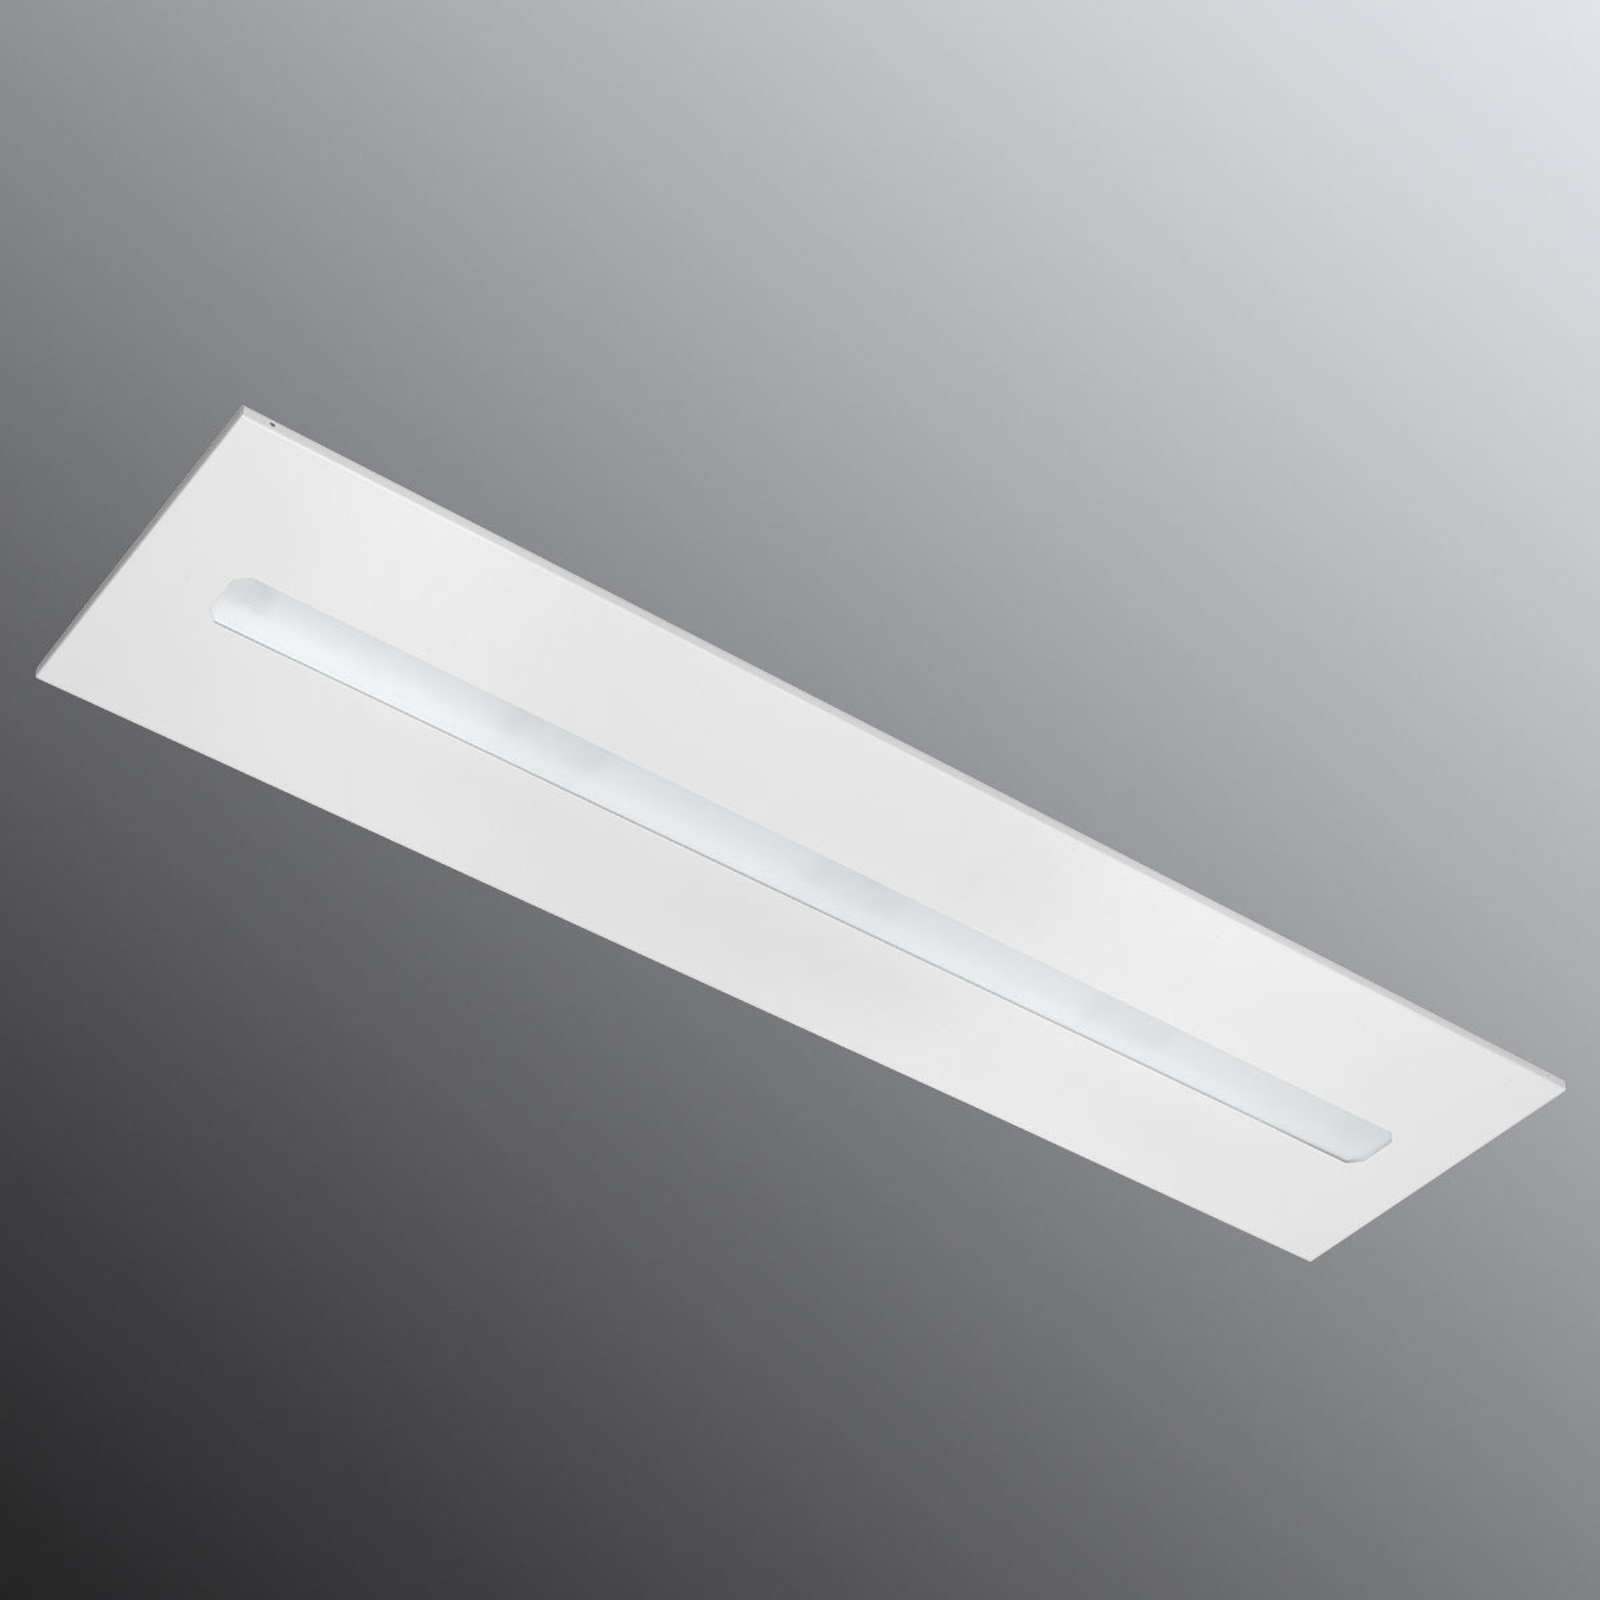 Freyn II Recessed LED-paneeli 124,5 x 31cm, 3000 K